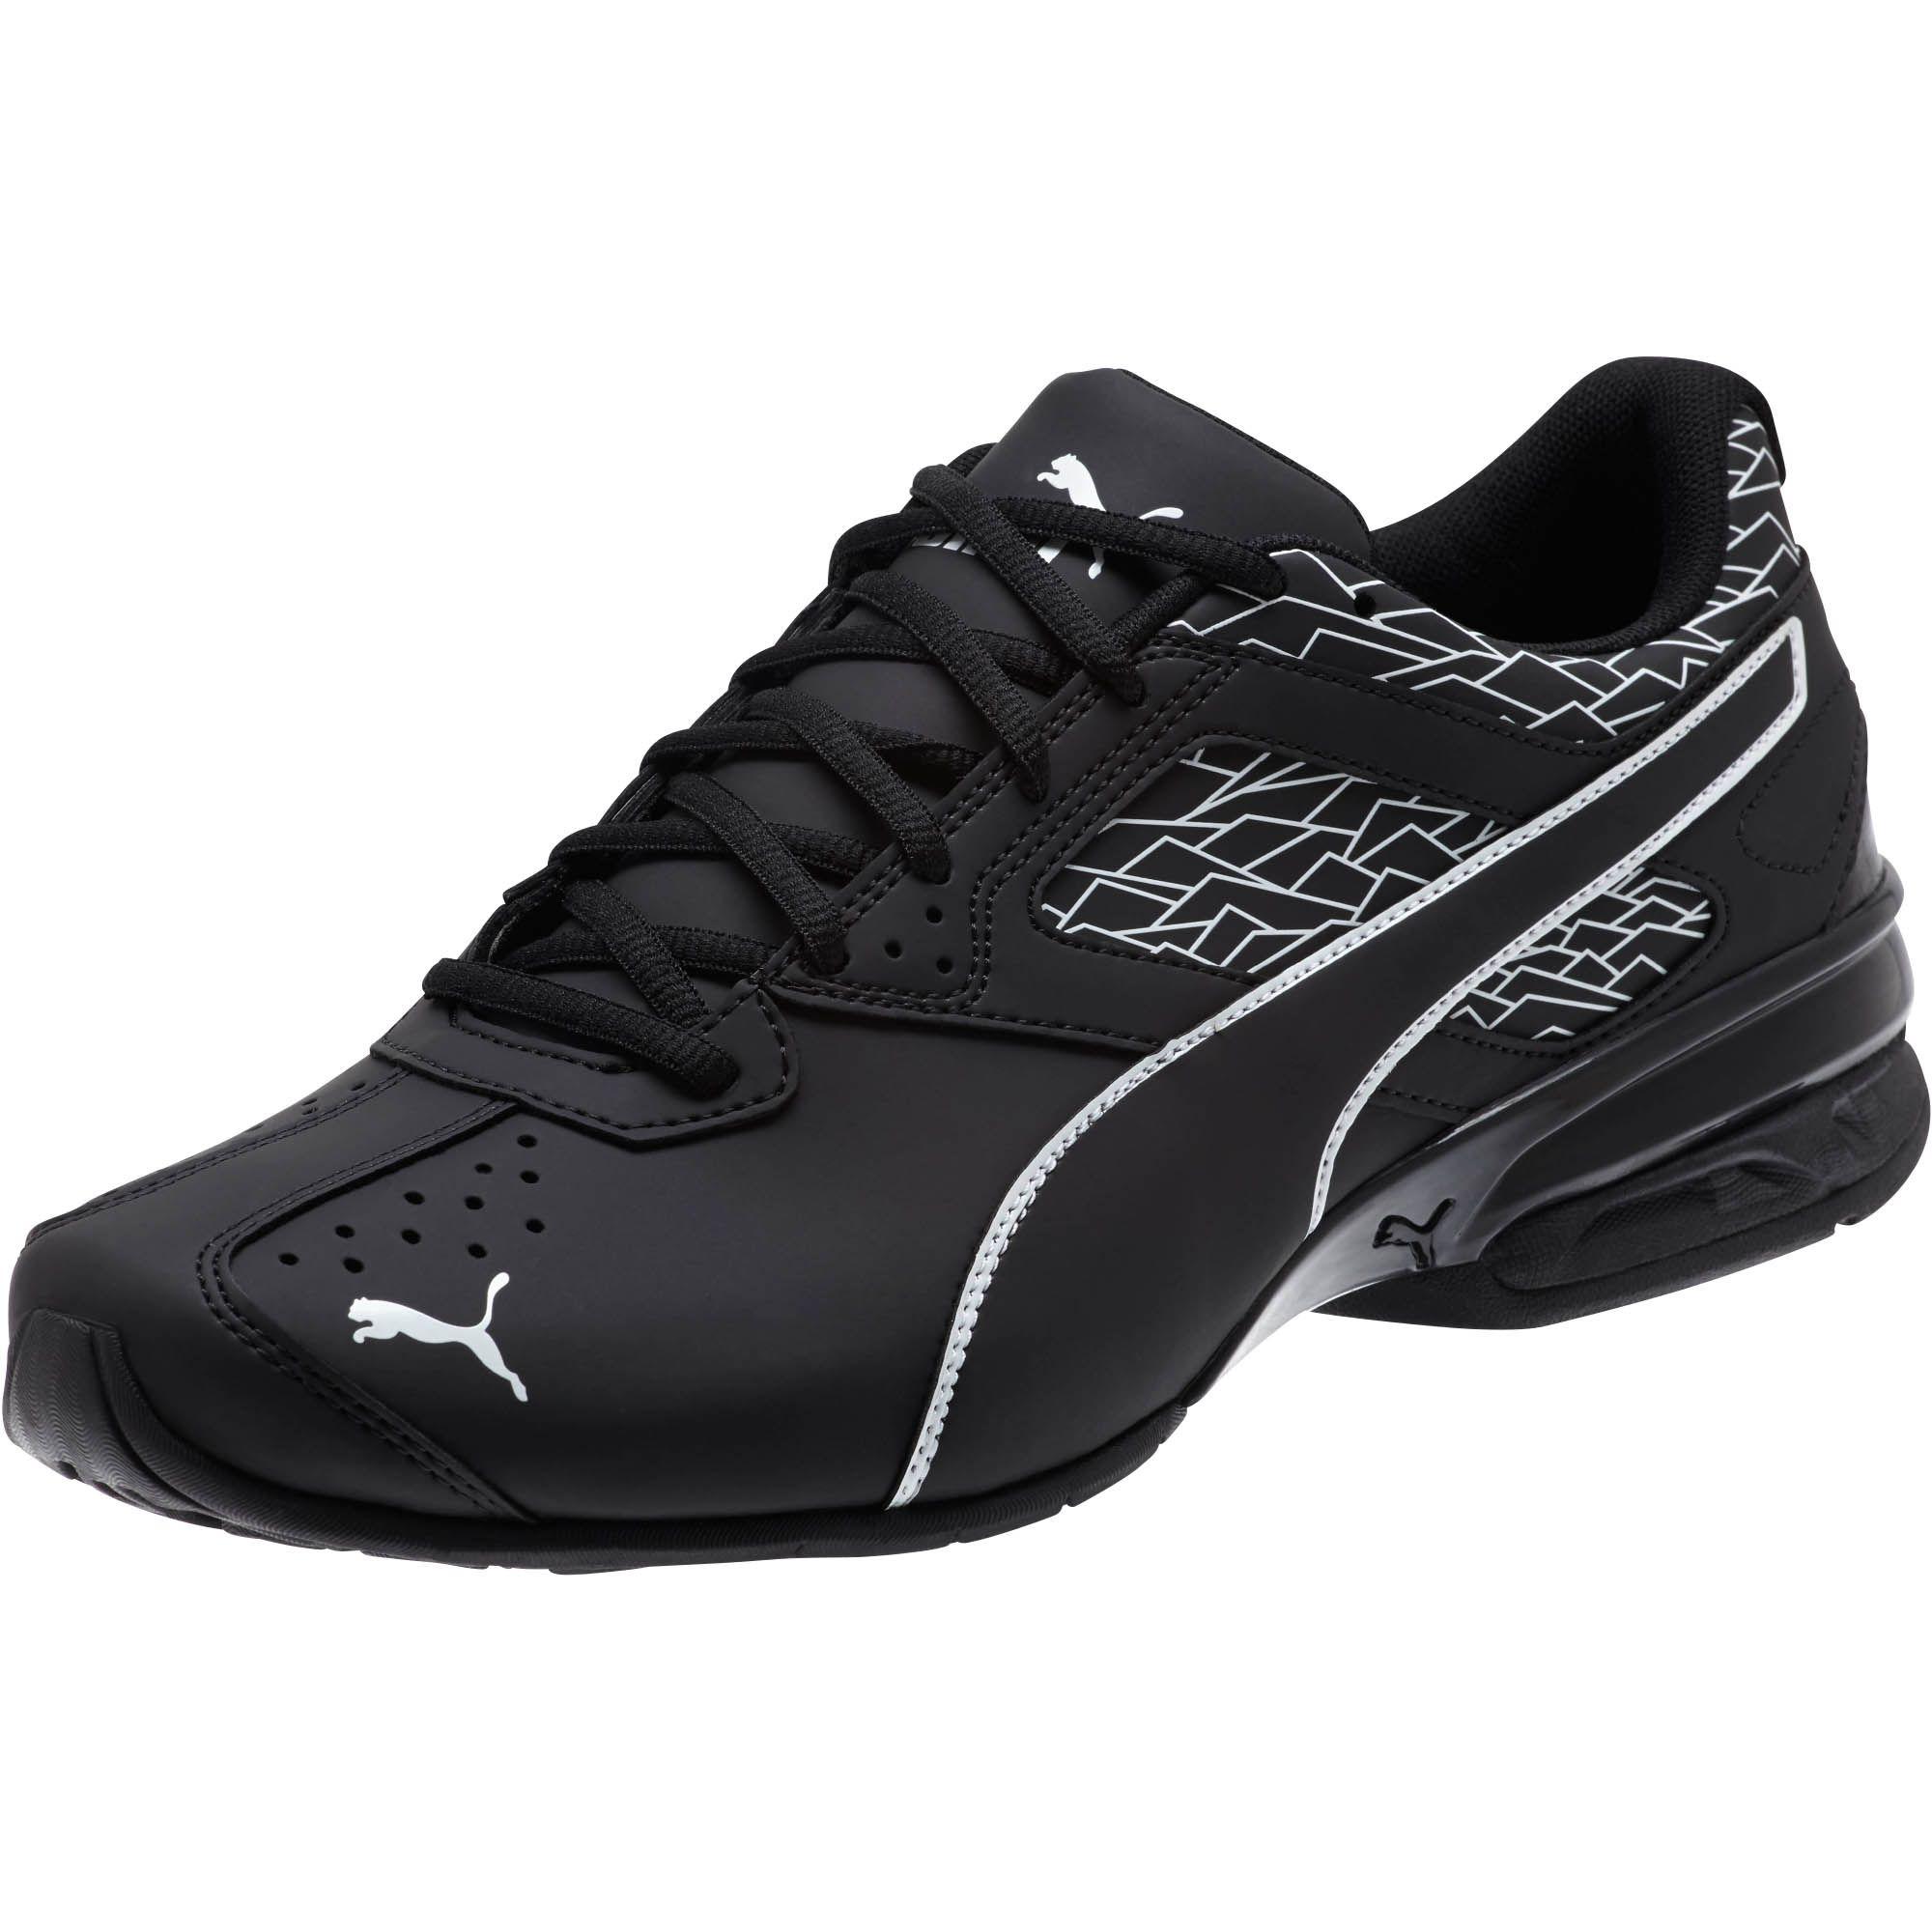 Puma Tazon 6 Fracture Men' Running Shoes